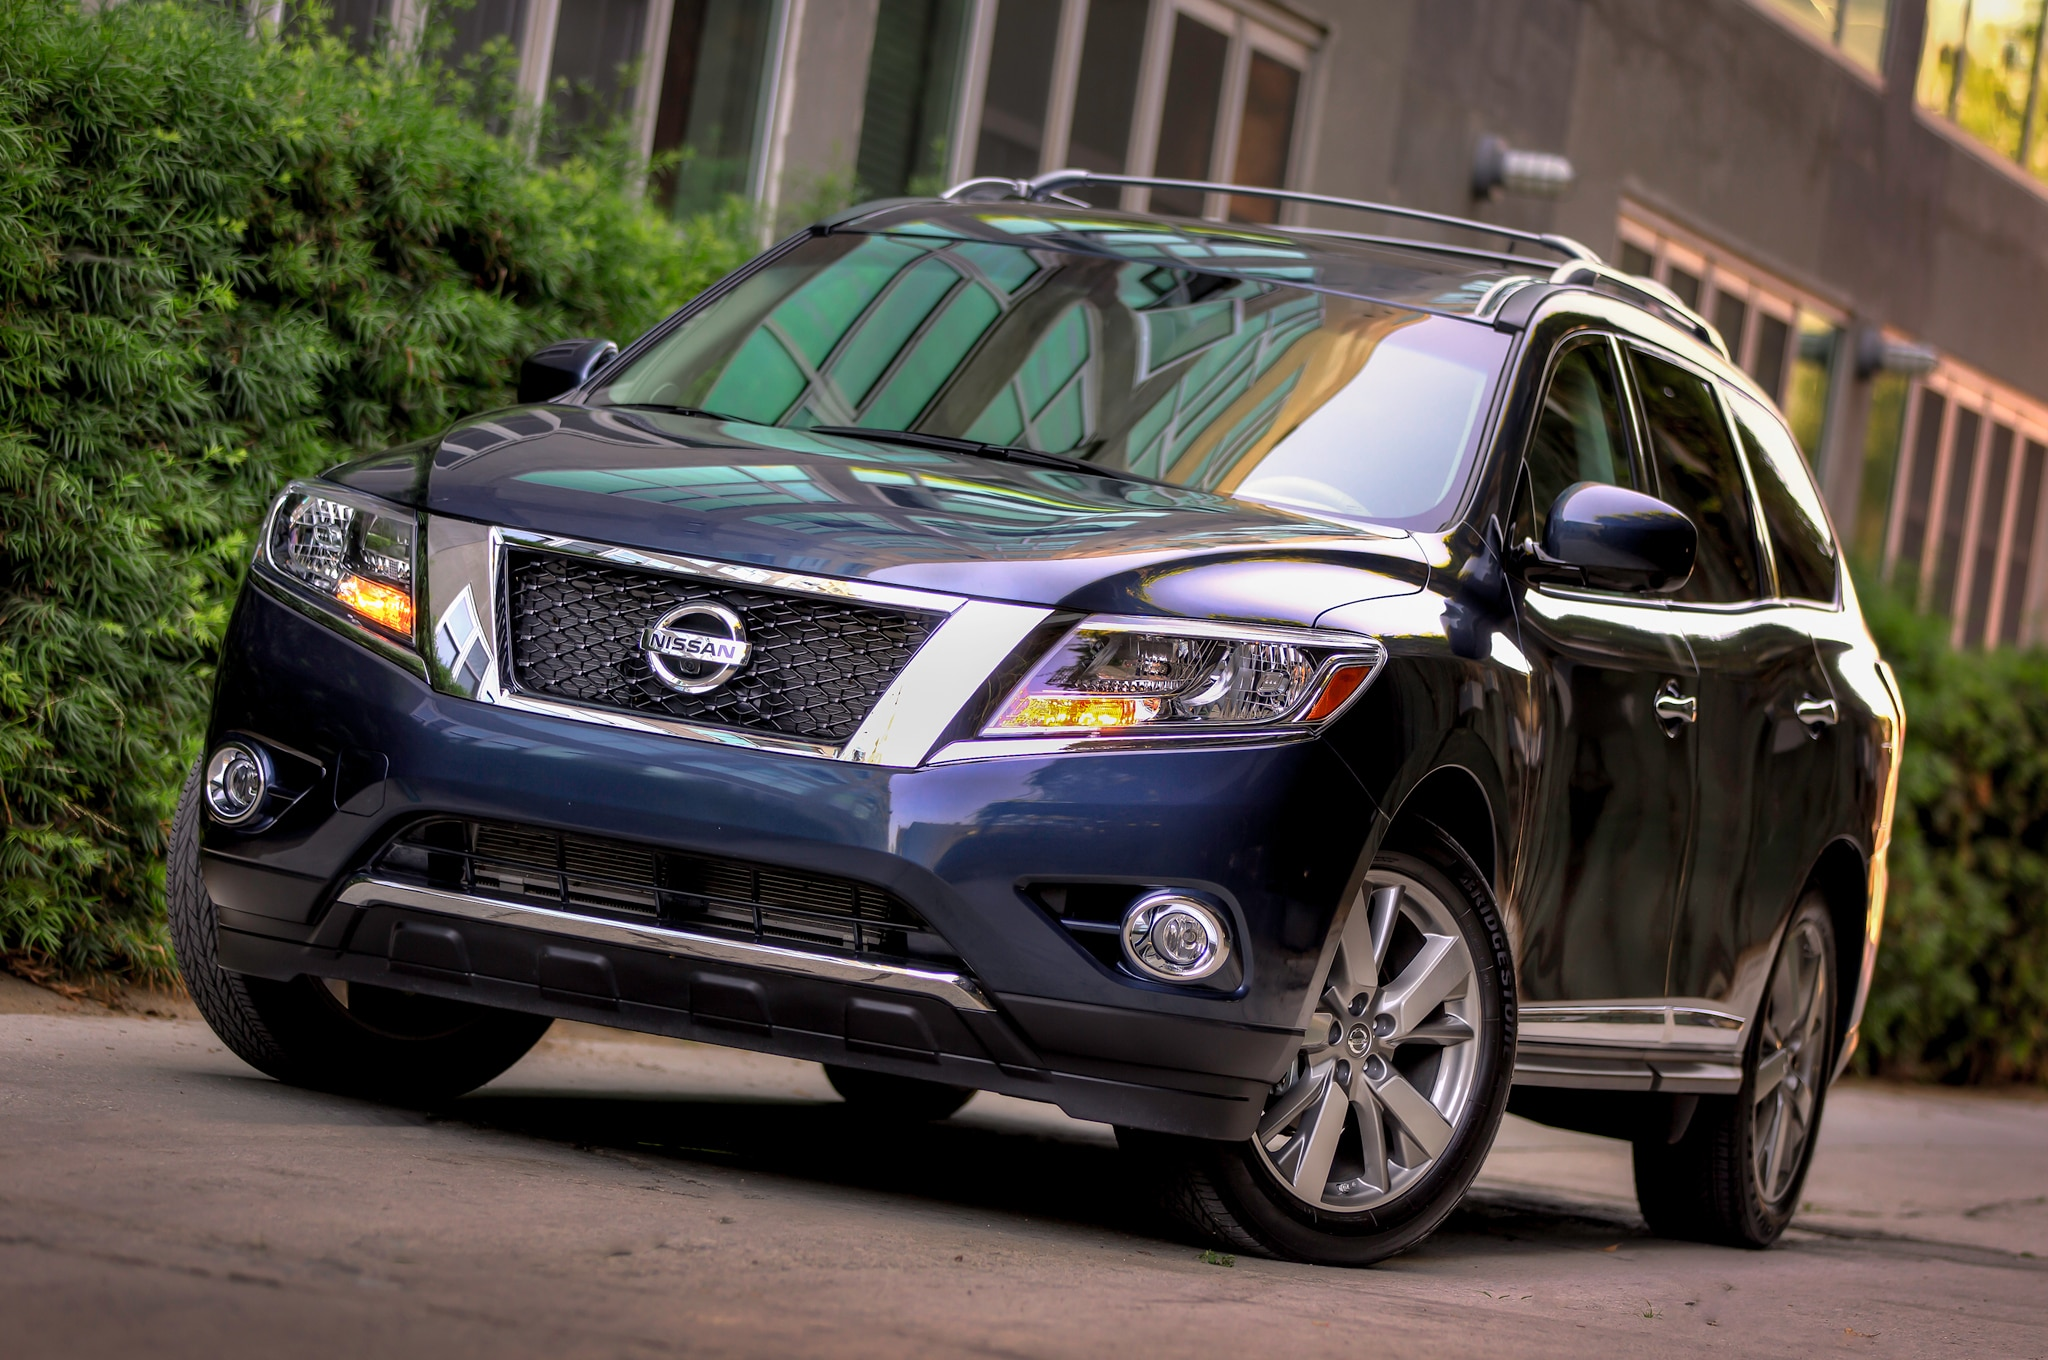 2014 Nissan Pathfinder Front